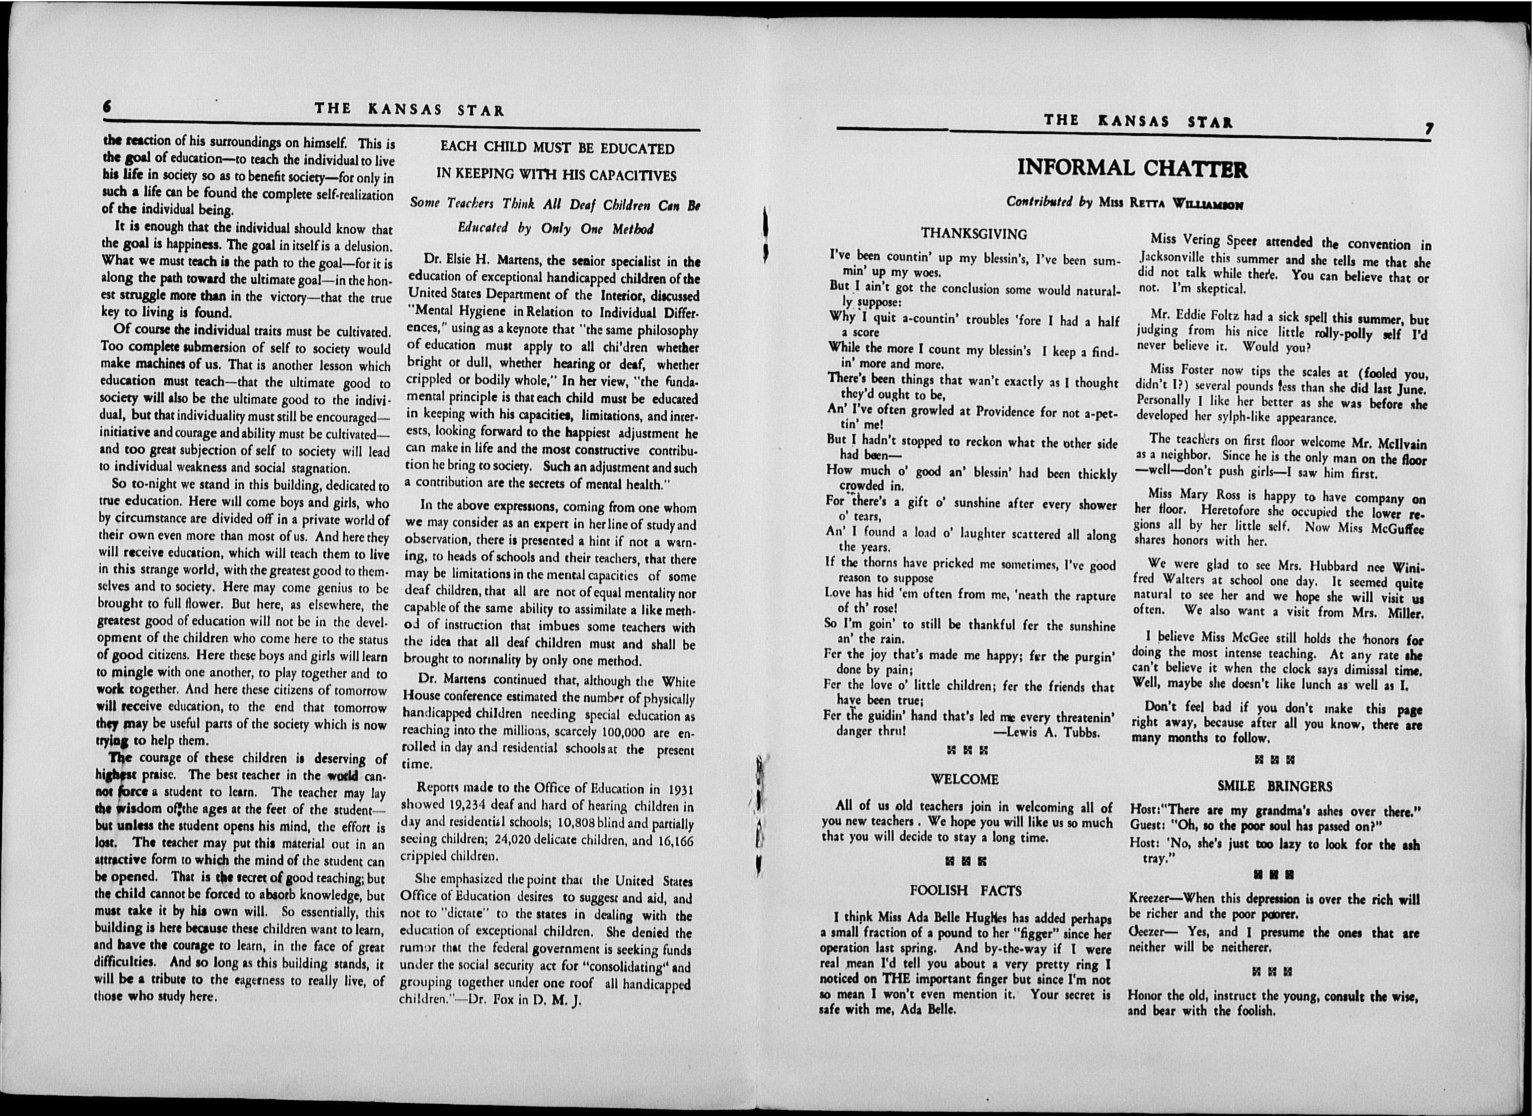 The Kansas Star, volume 50, number 1 - 6-7